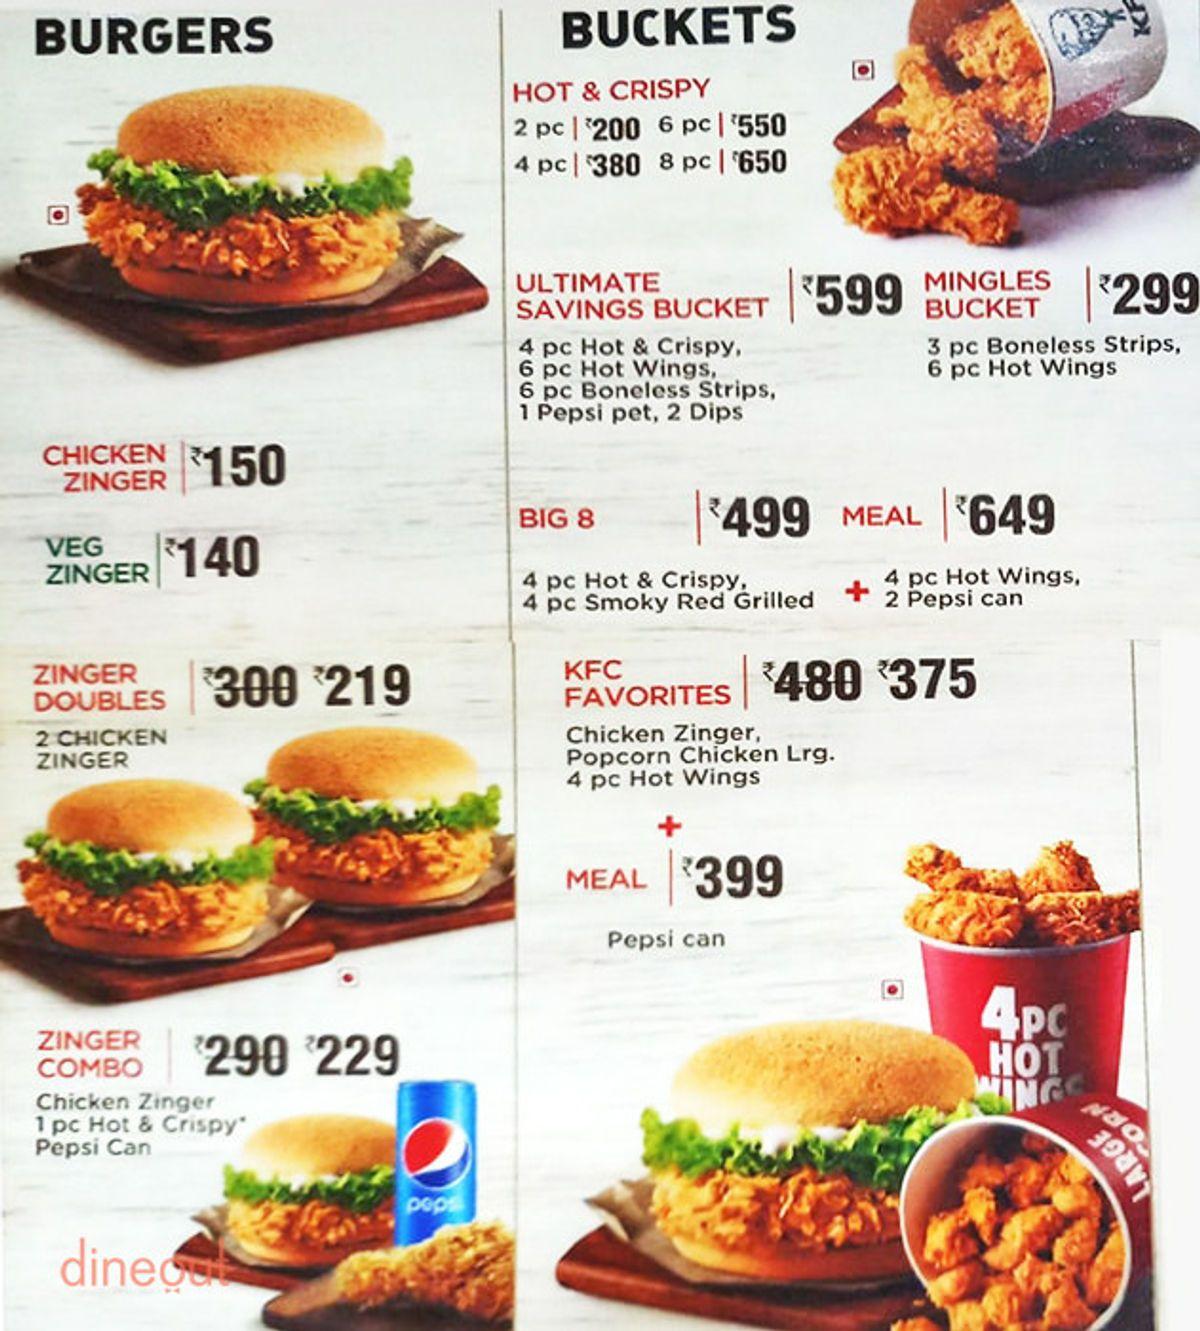 Kfc Menu Buckets Prices In 2020 B Food Kentucky Fried Chicken Menu Kfc